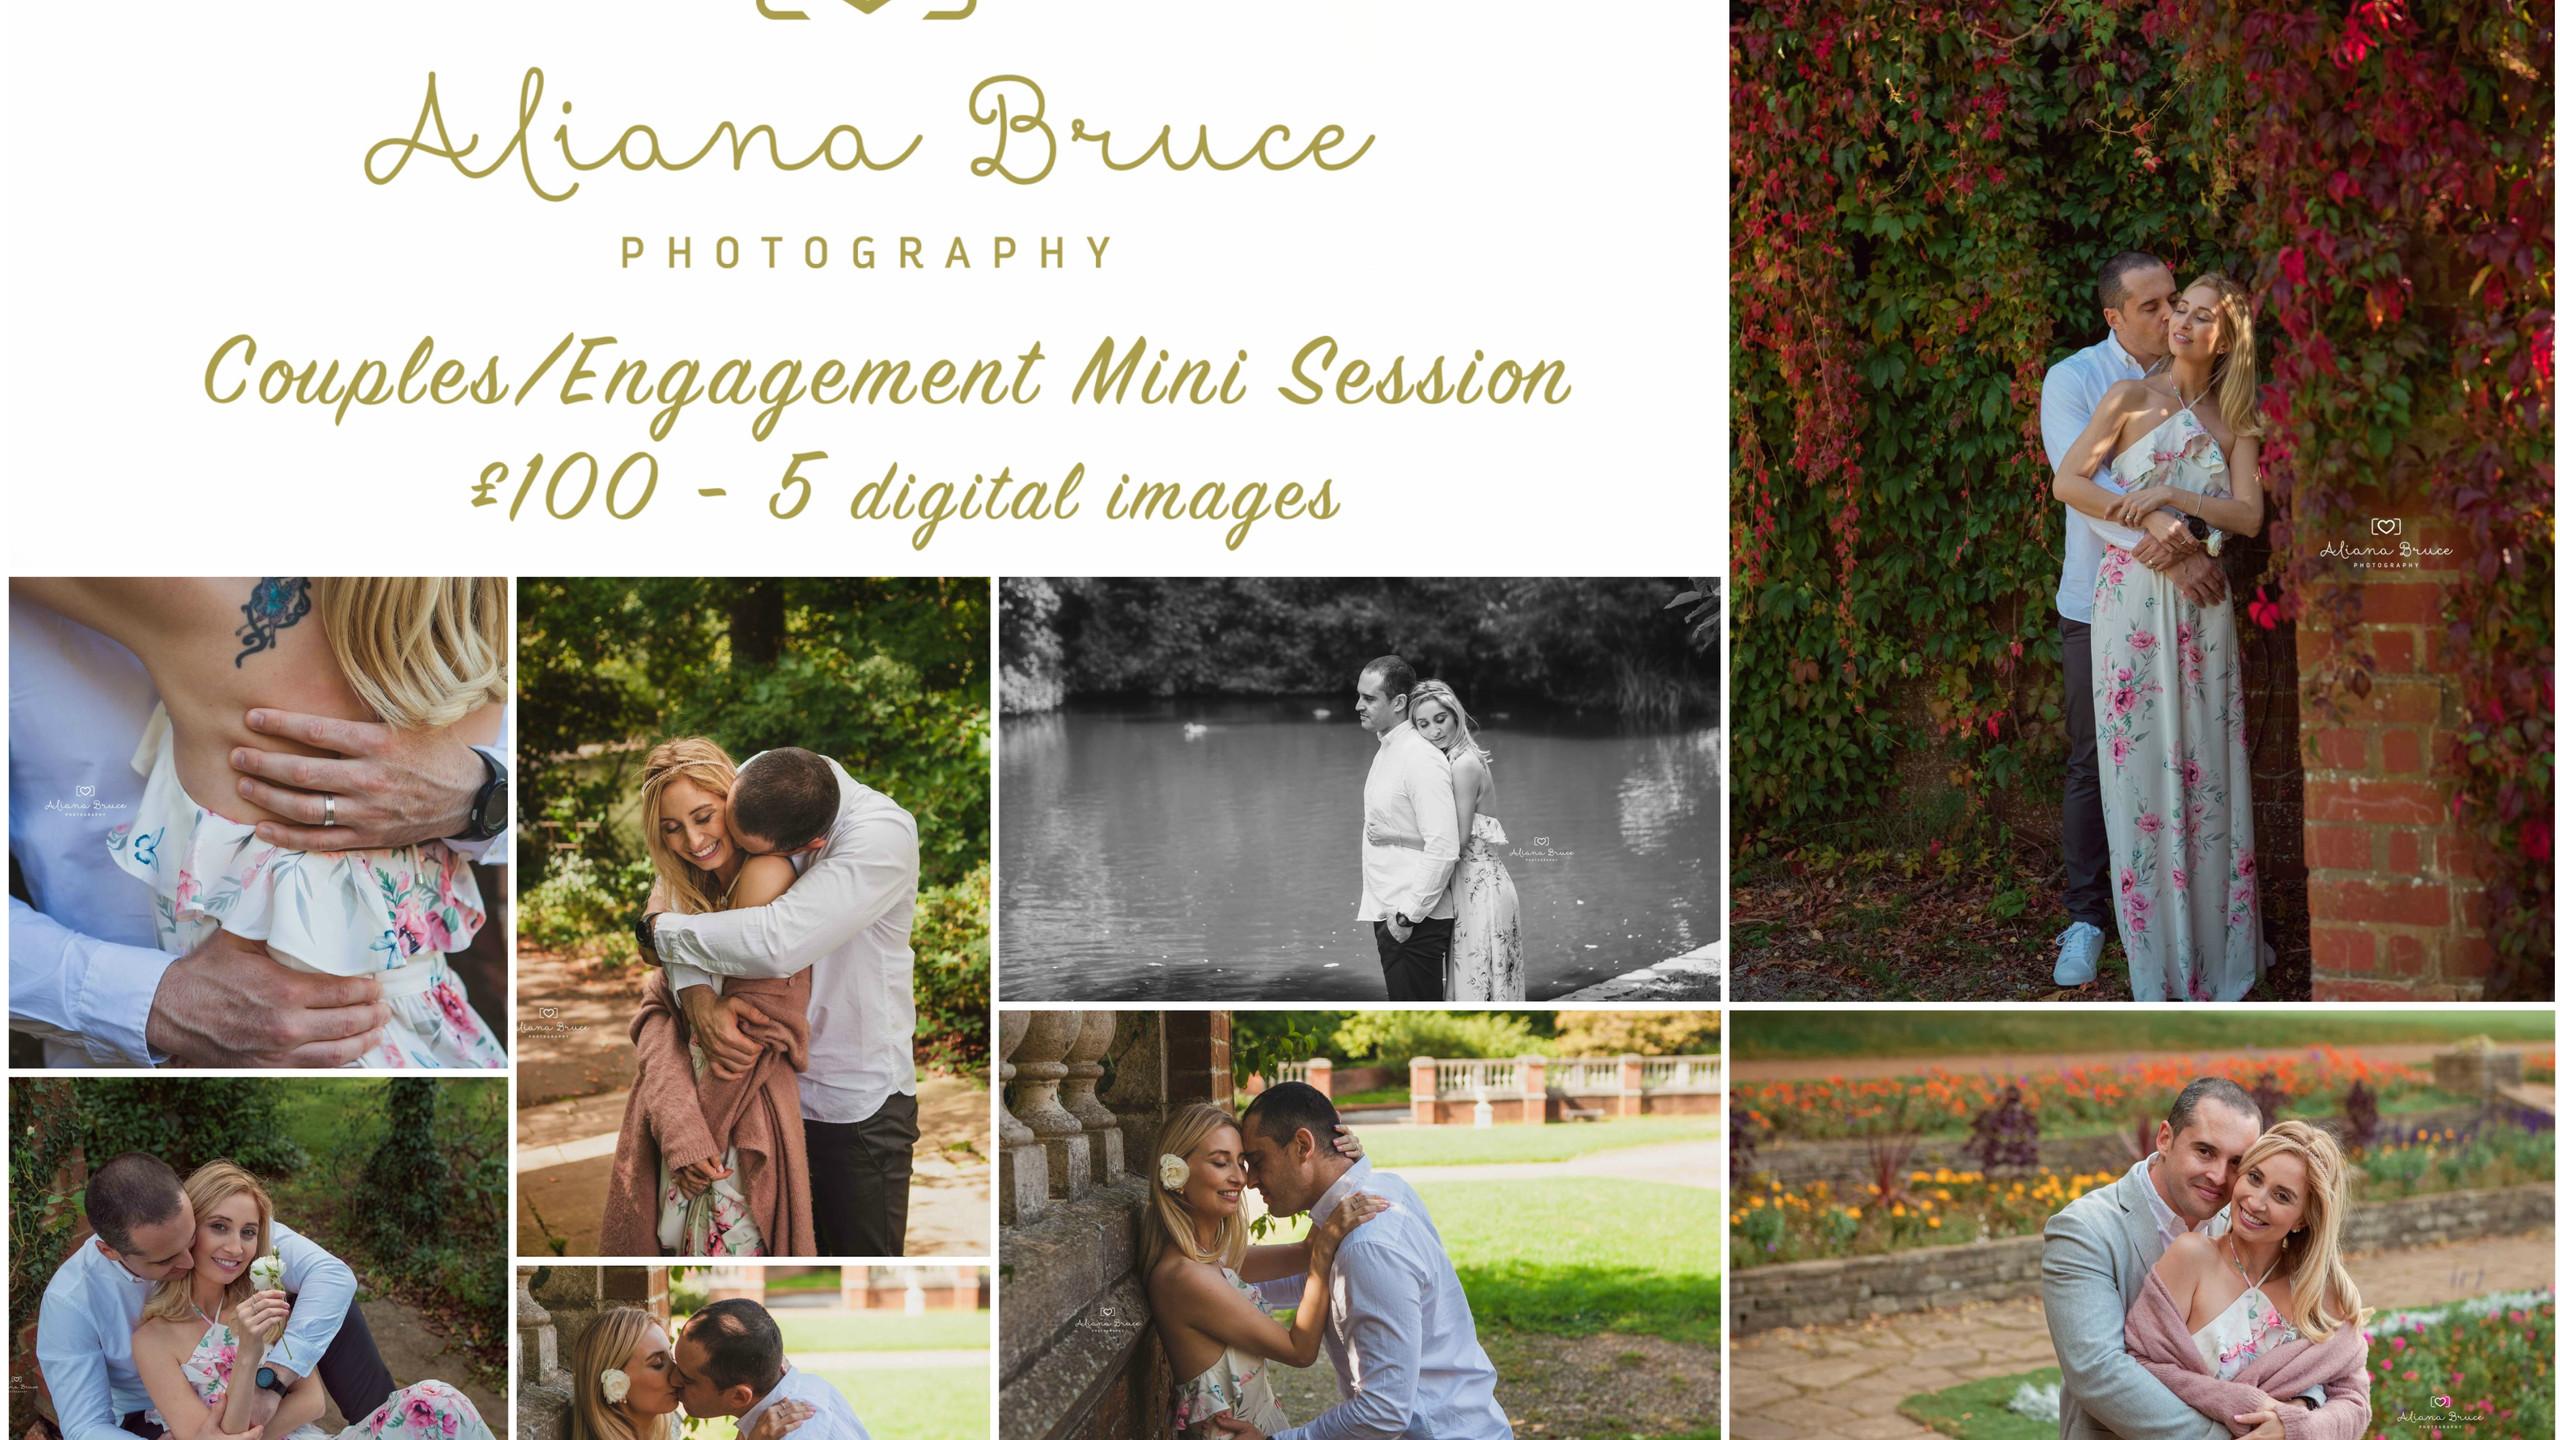 Couples mini Session Collage